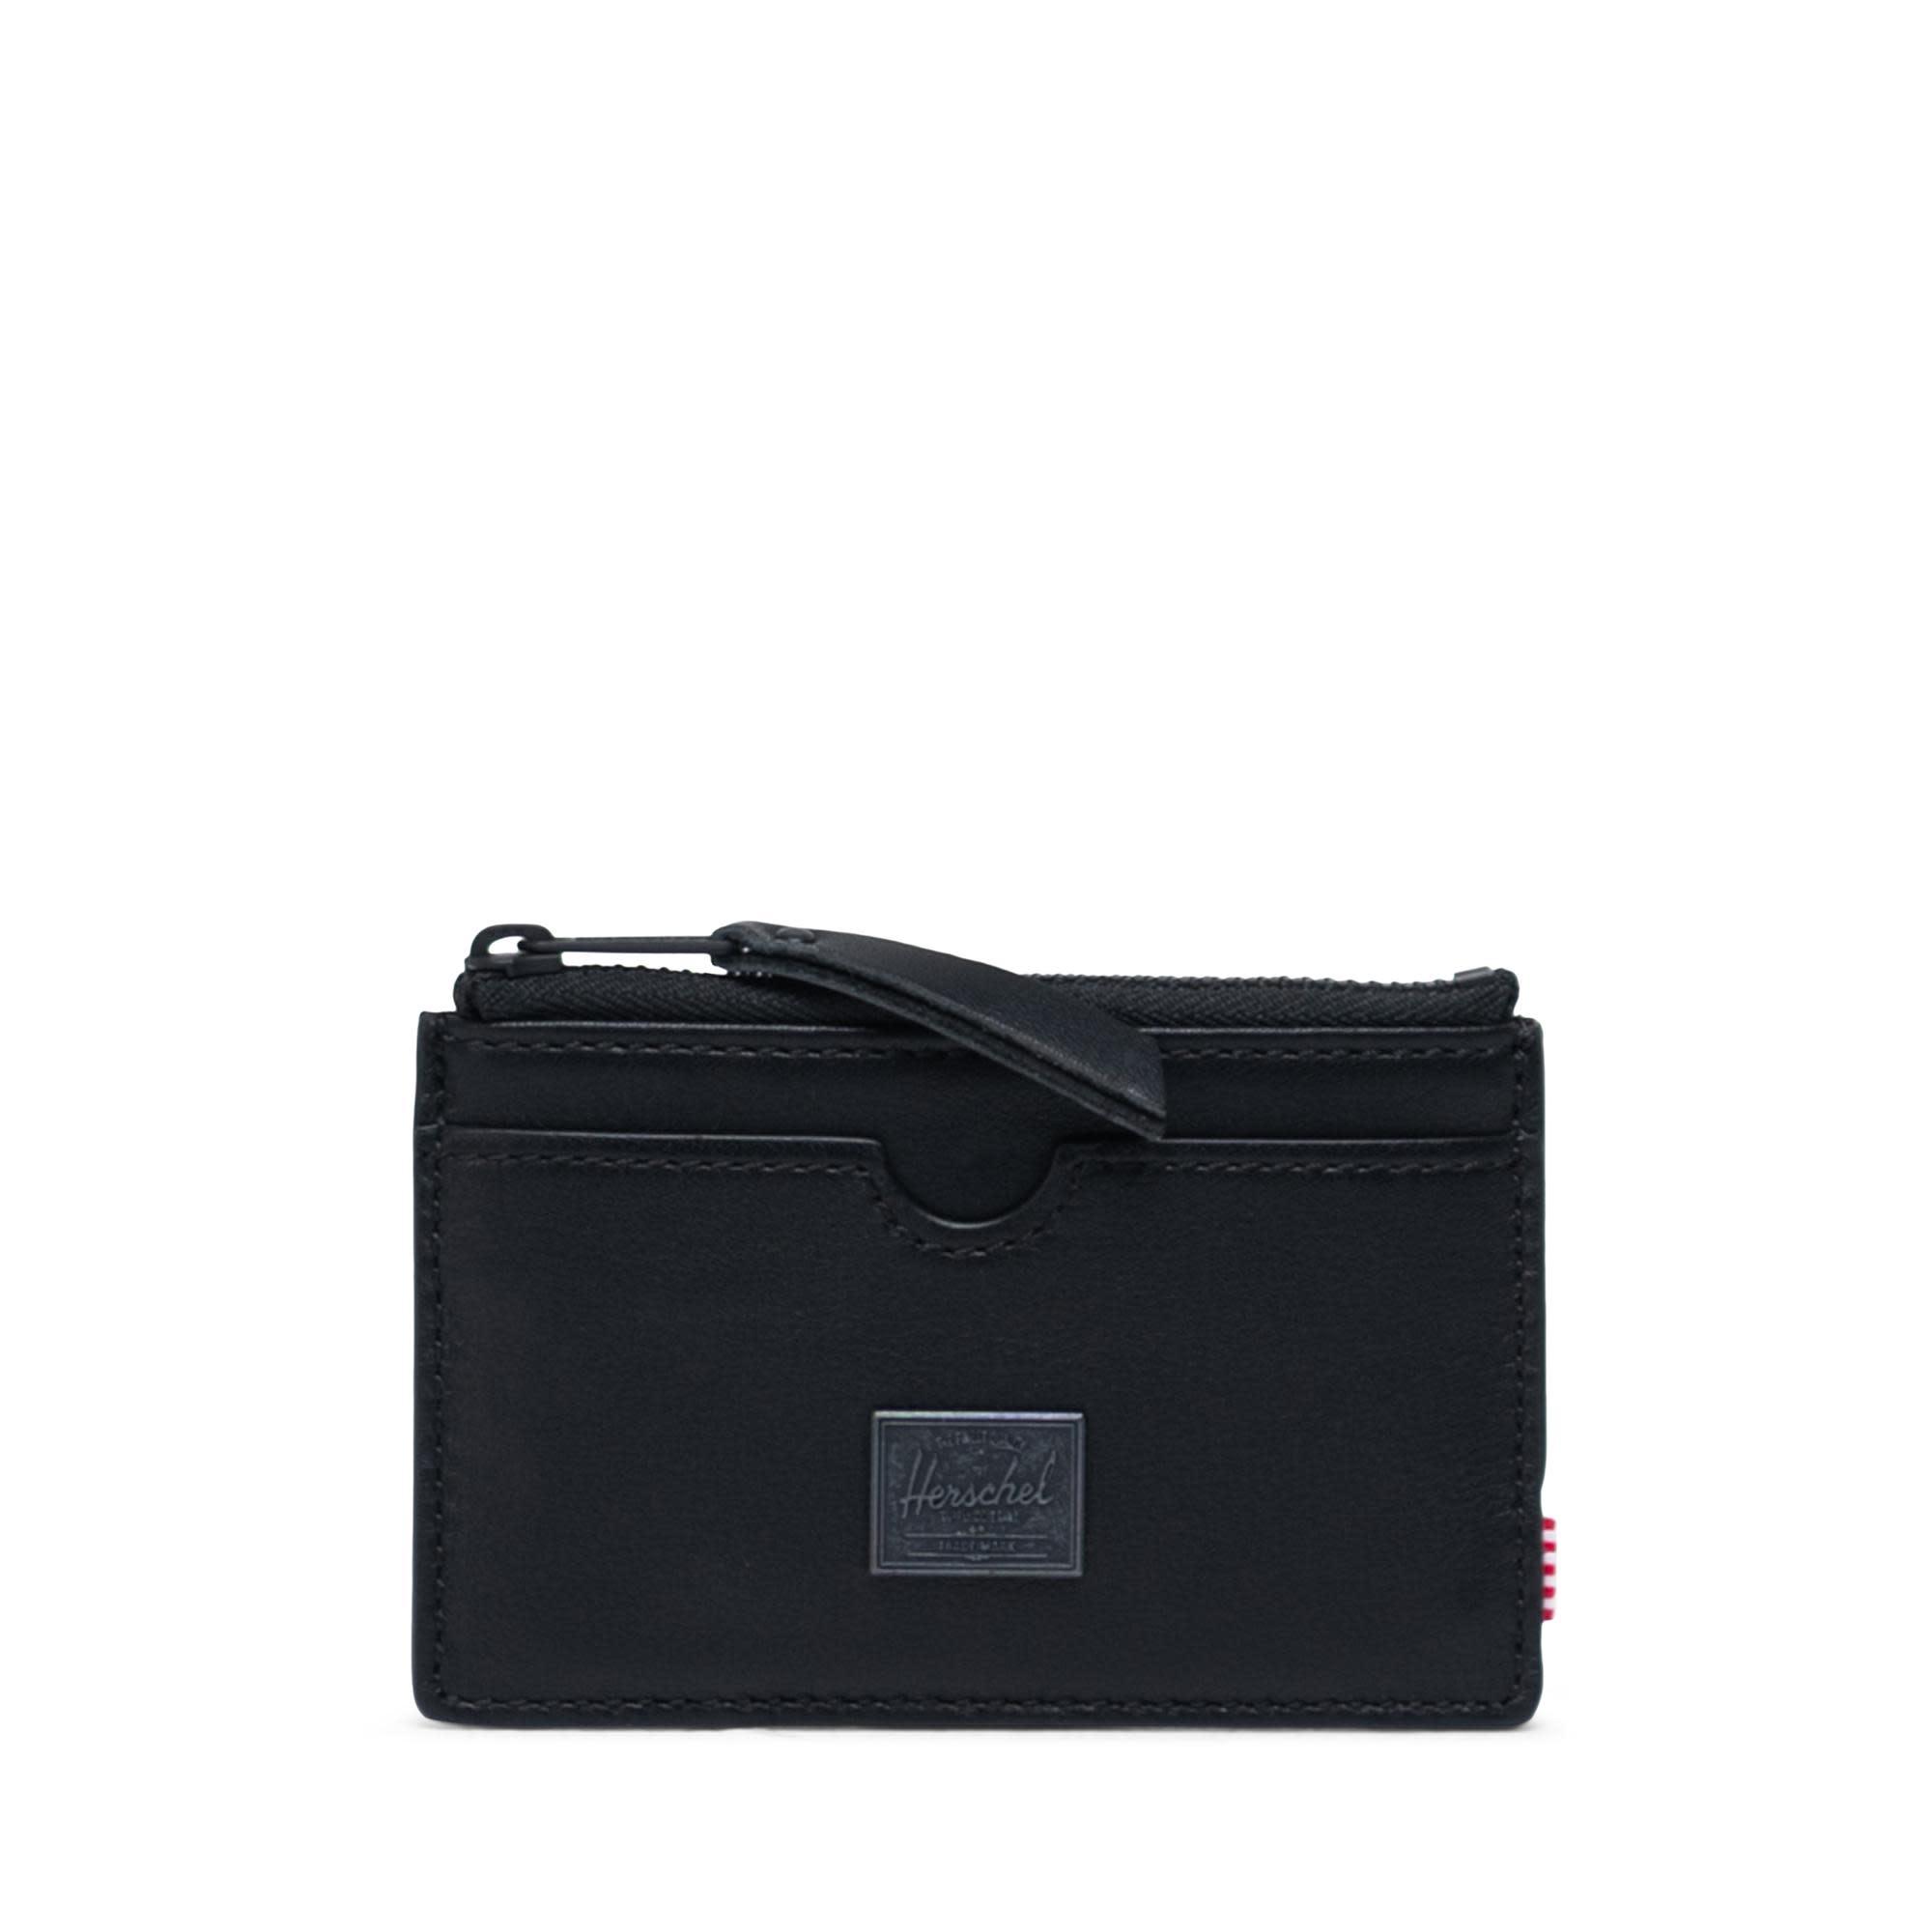 Herschel Supply Co. Herschel Oscar Leather Wallet - Black